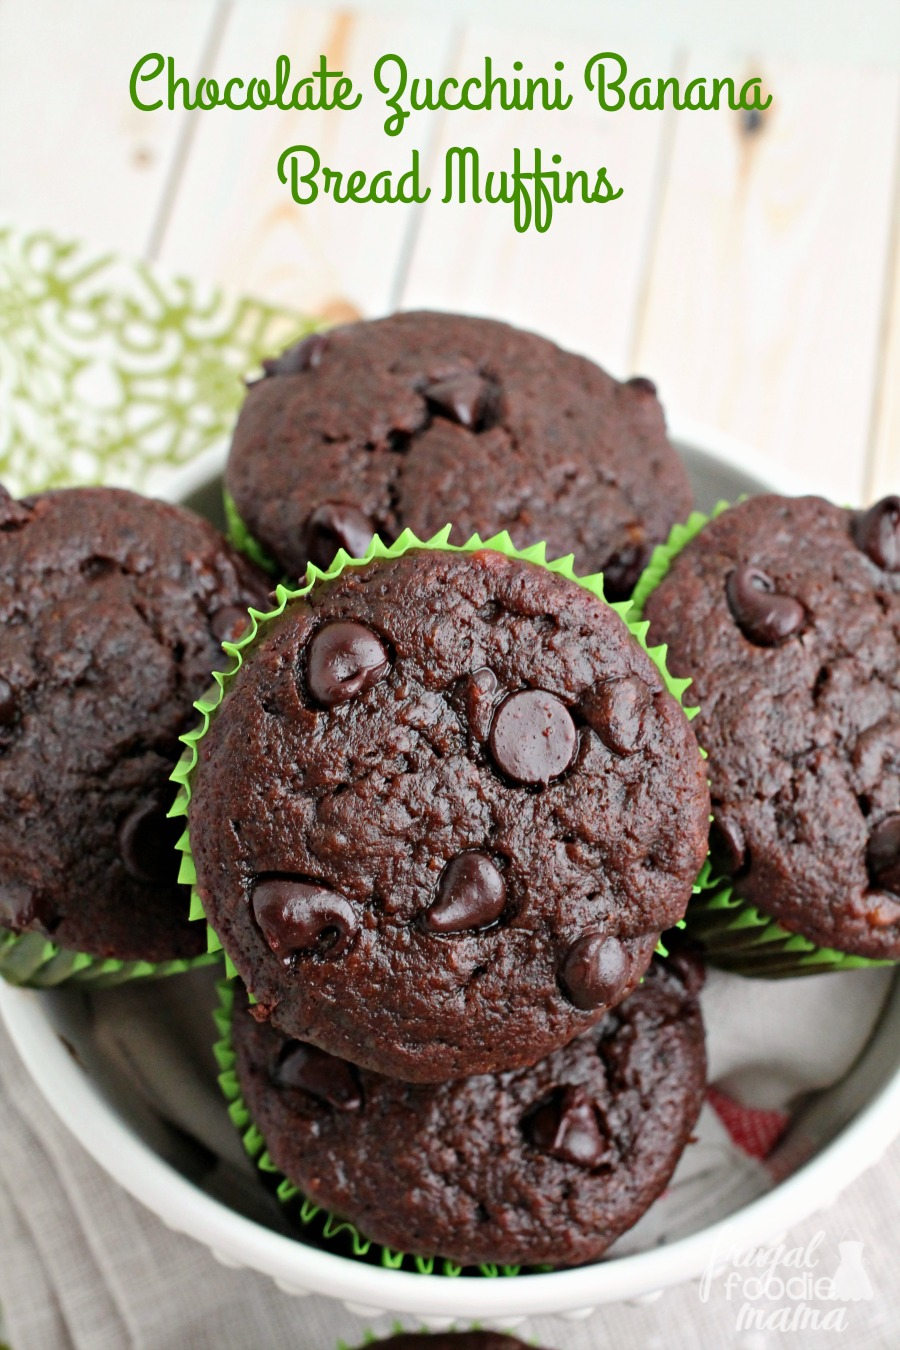 Frugal Foodie Mama: Chocolate Zucchini Banana Bread Muffins